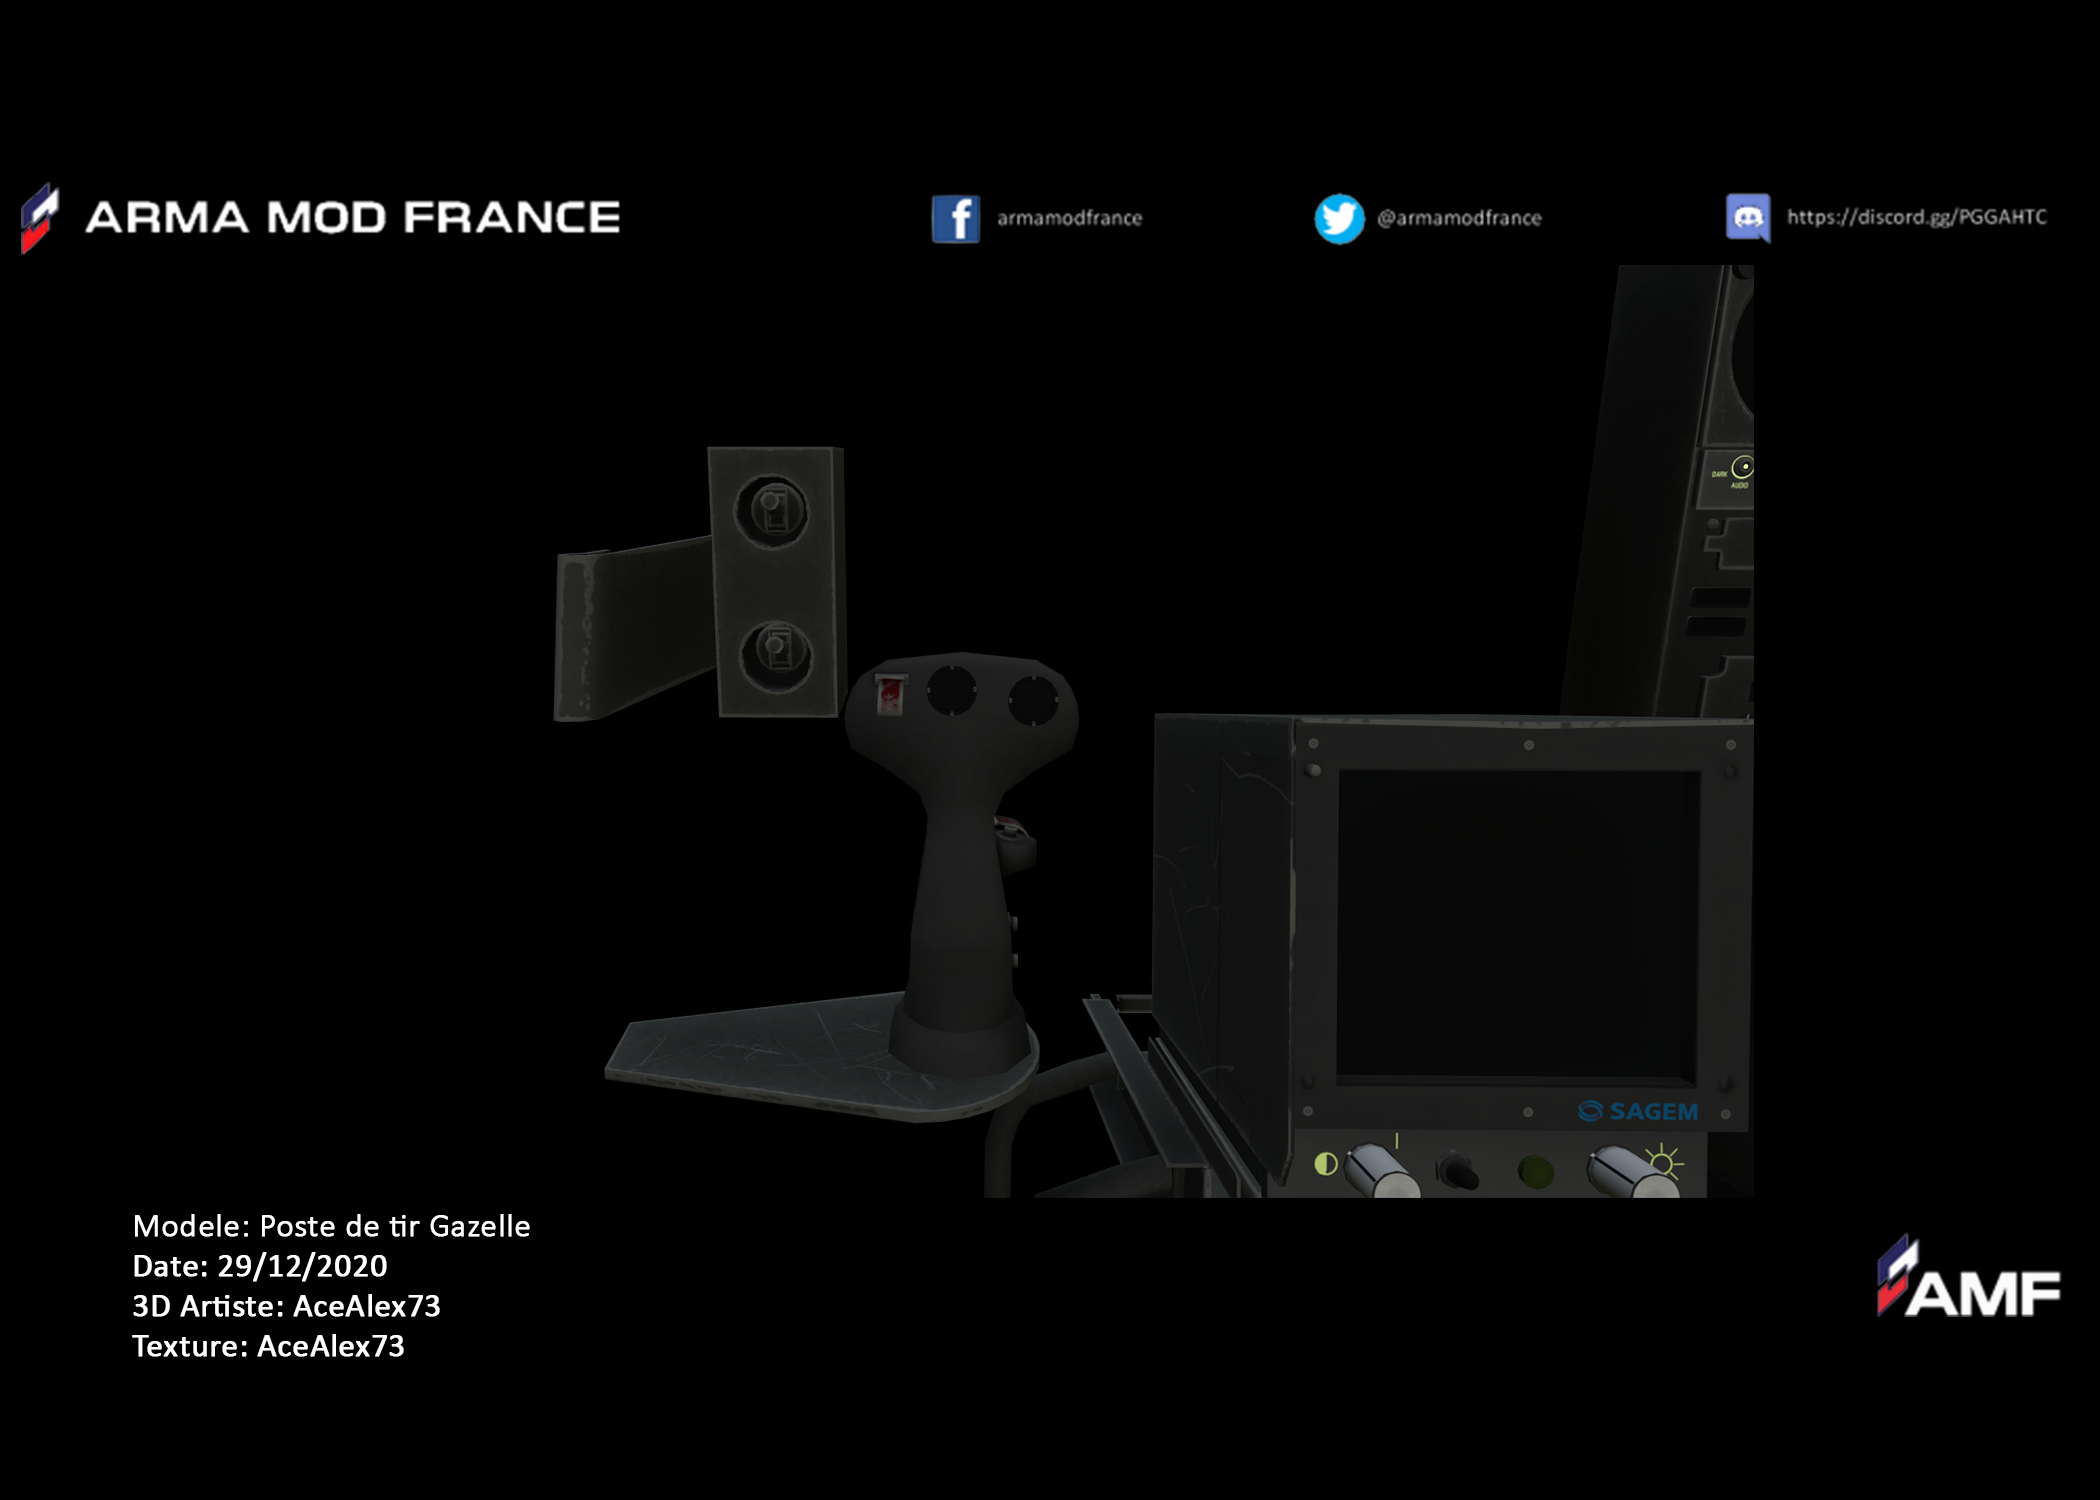 screenshot007.png